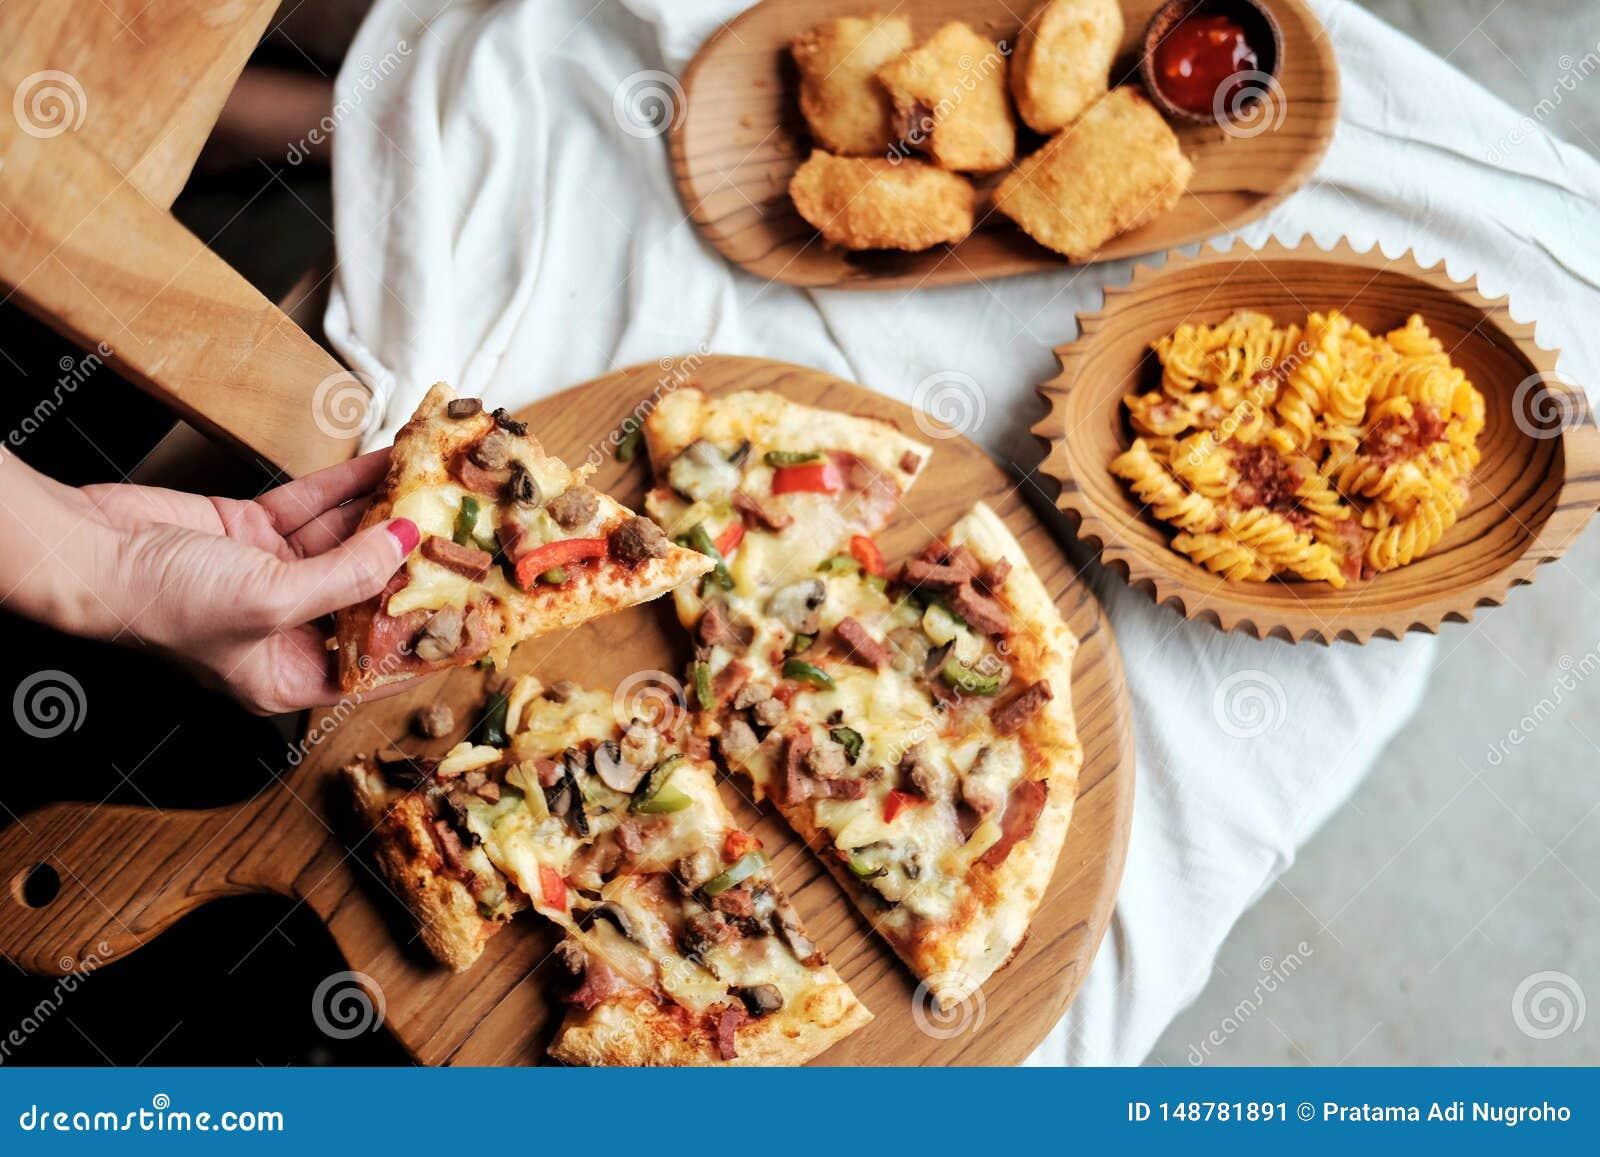 Consiga su pizza